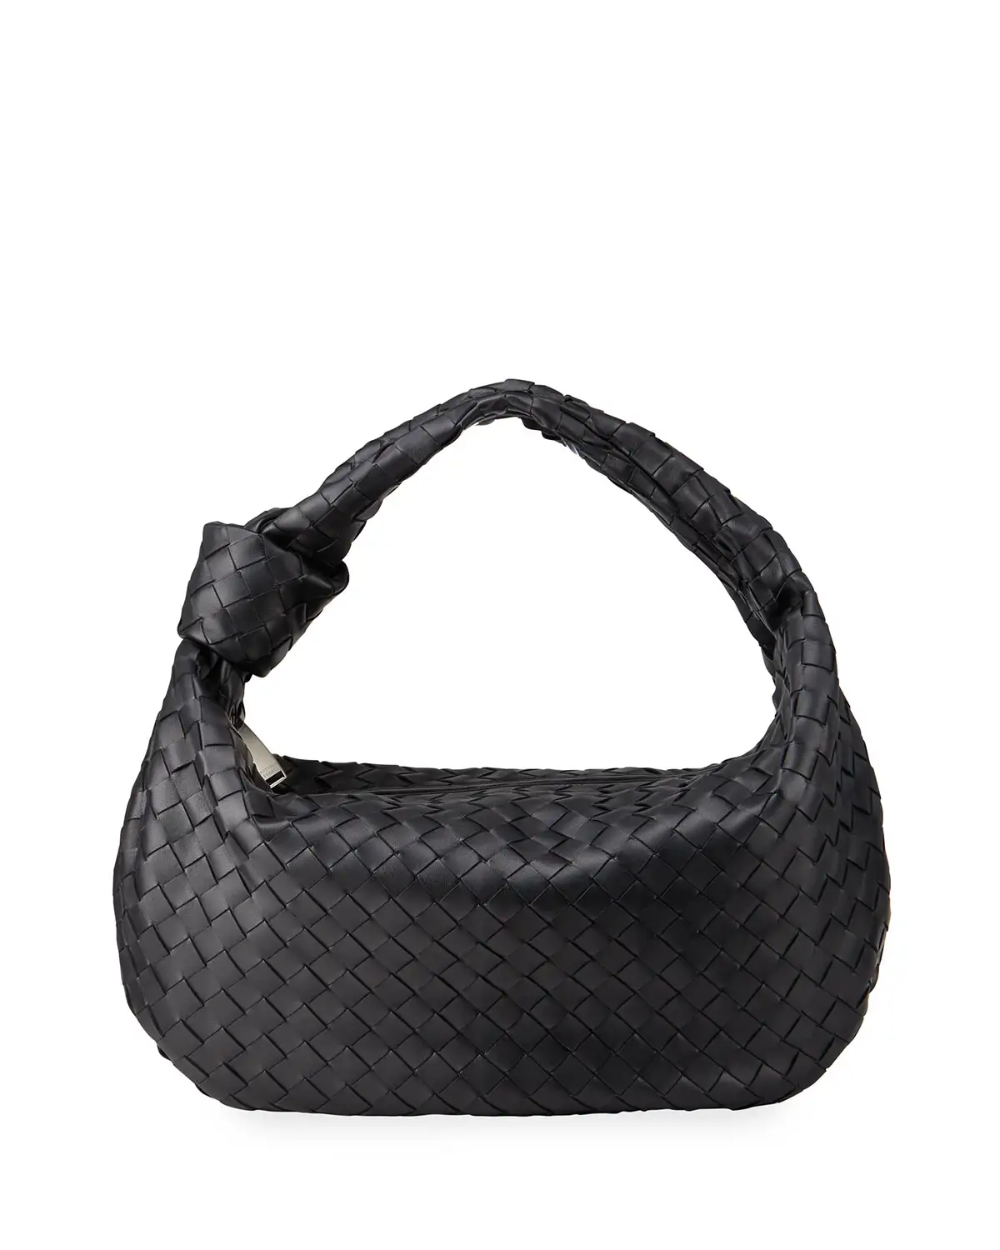 Bottega Veneta The Jodie Large Intrecciato Woven Leather